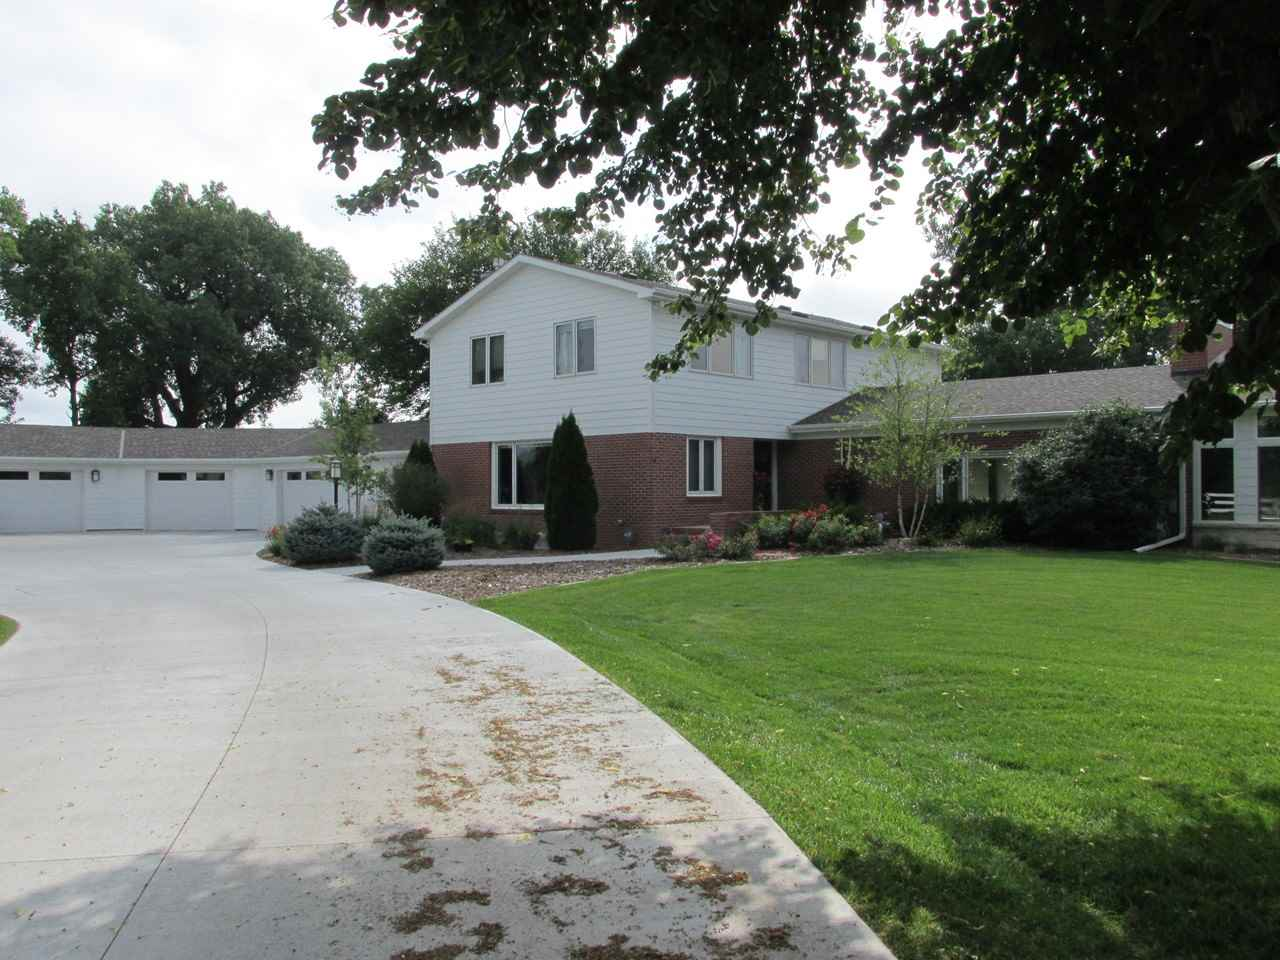 Real Estate for Sale, ListingId: 35727230, Hastings,NE68901